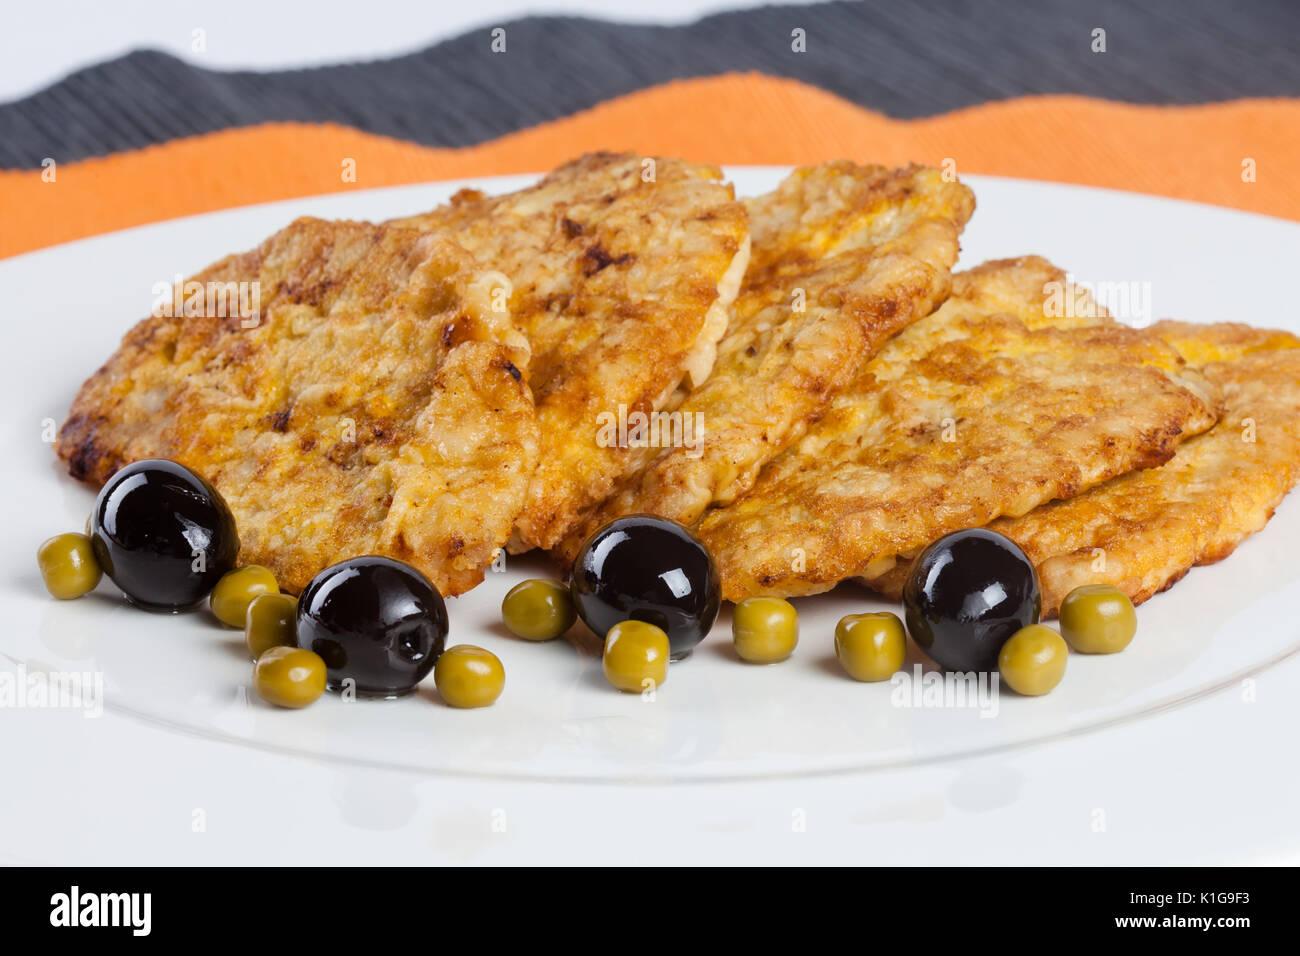 chicken fried steak  - Stock Image